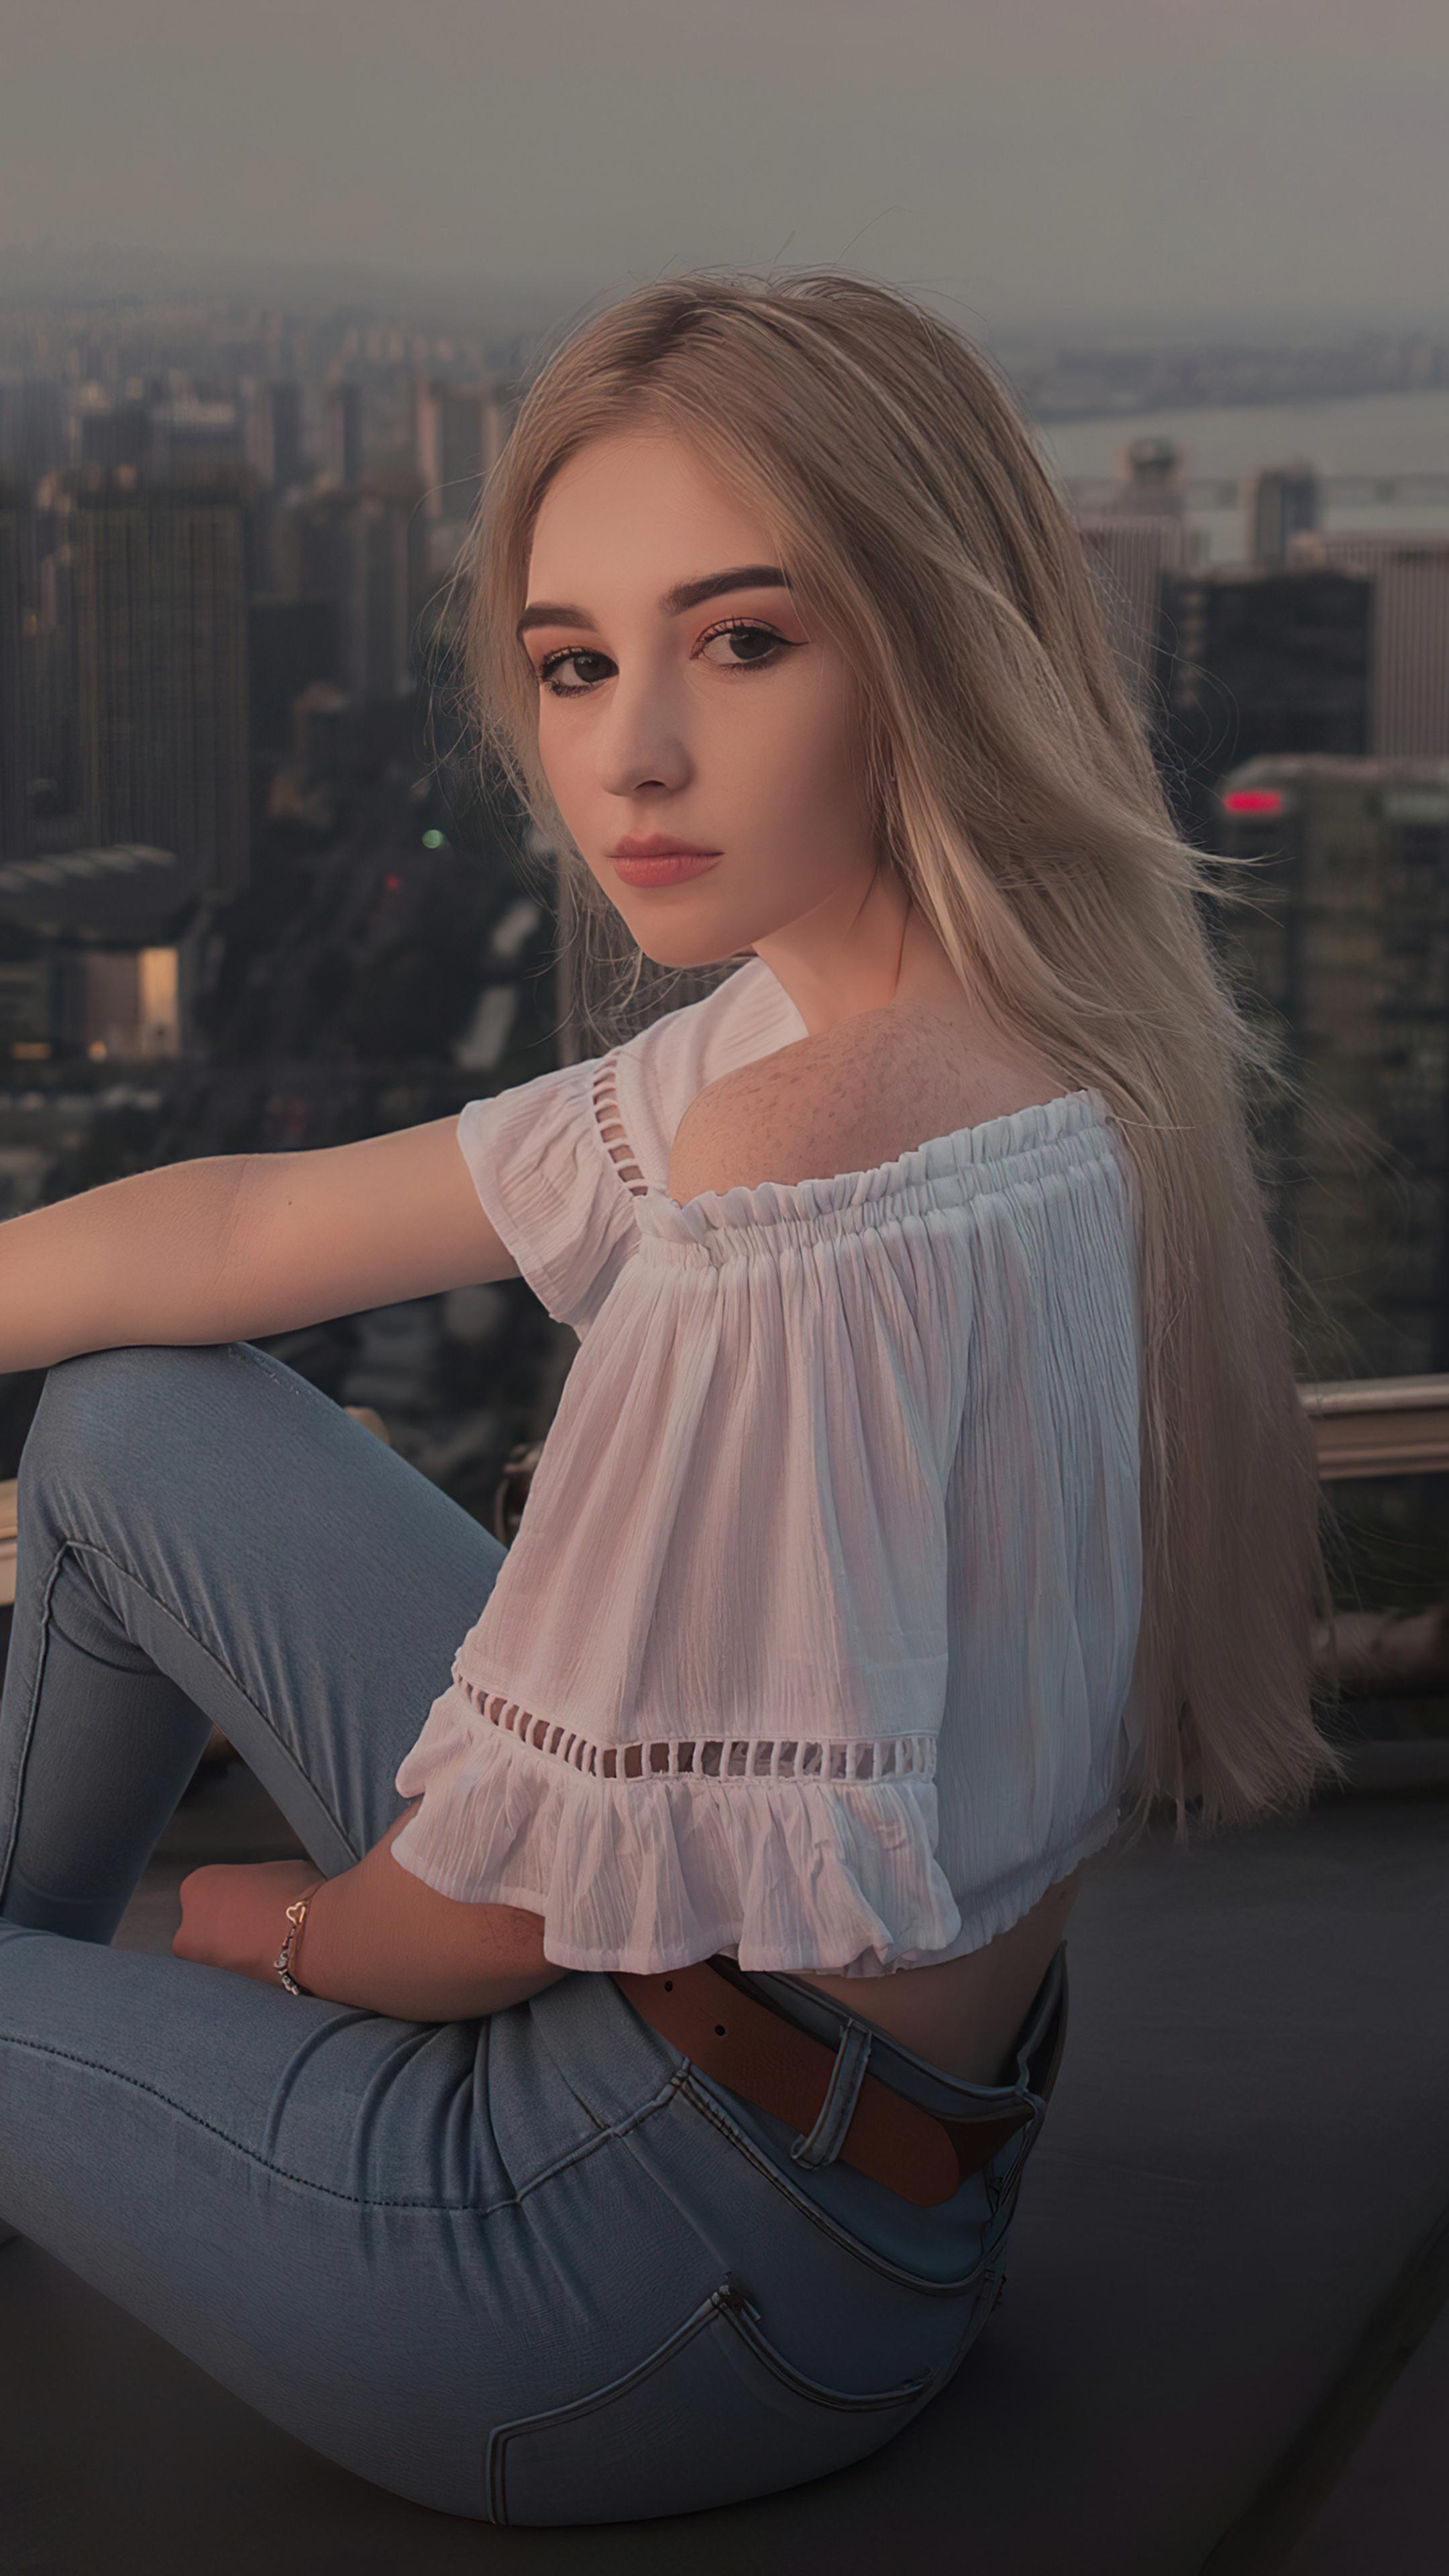 2160x3840 Girl Sitting Messy Hair Outdoor Sony Xperia X,XZ